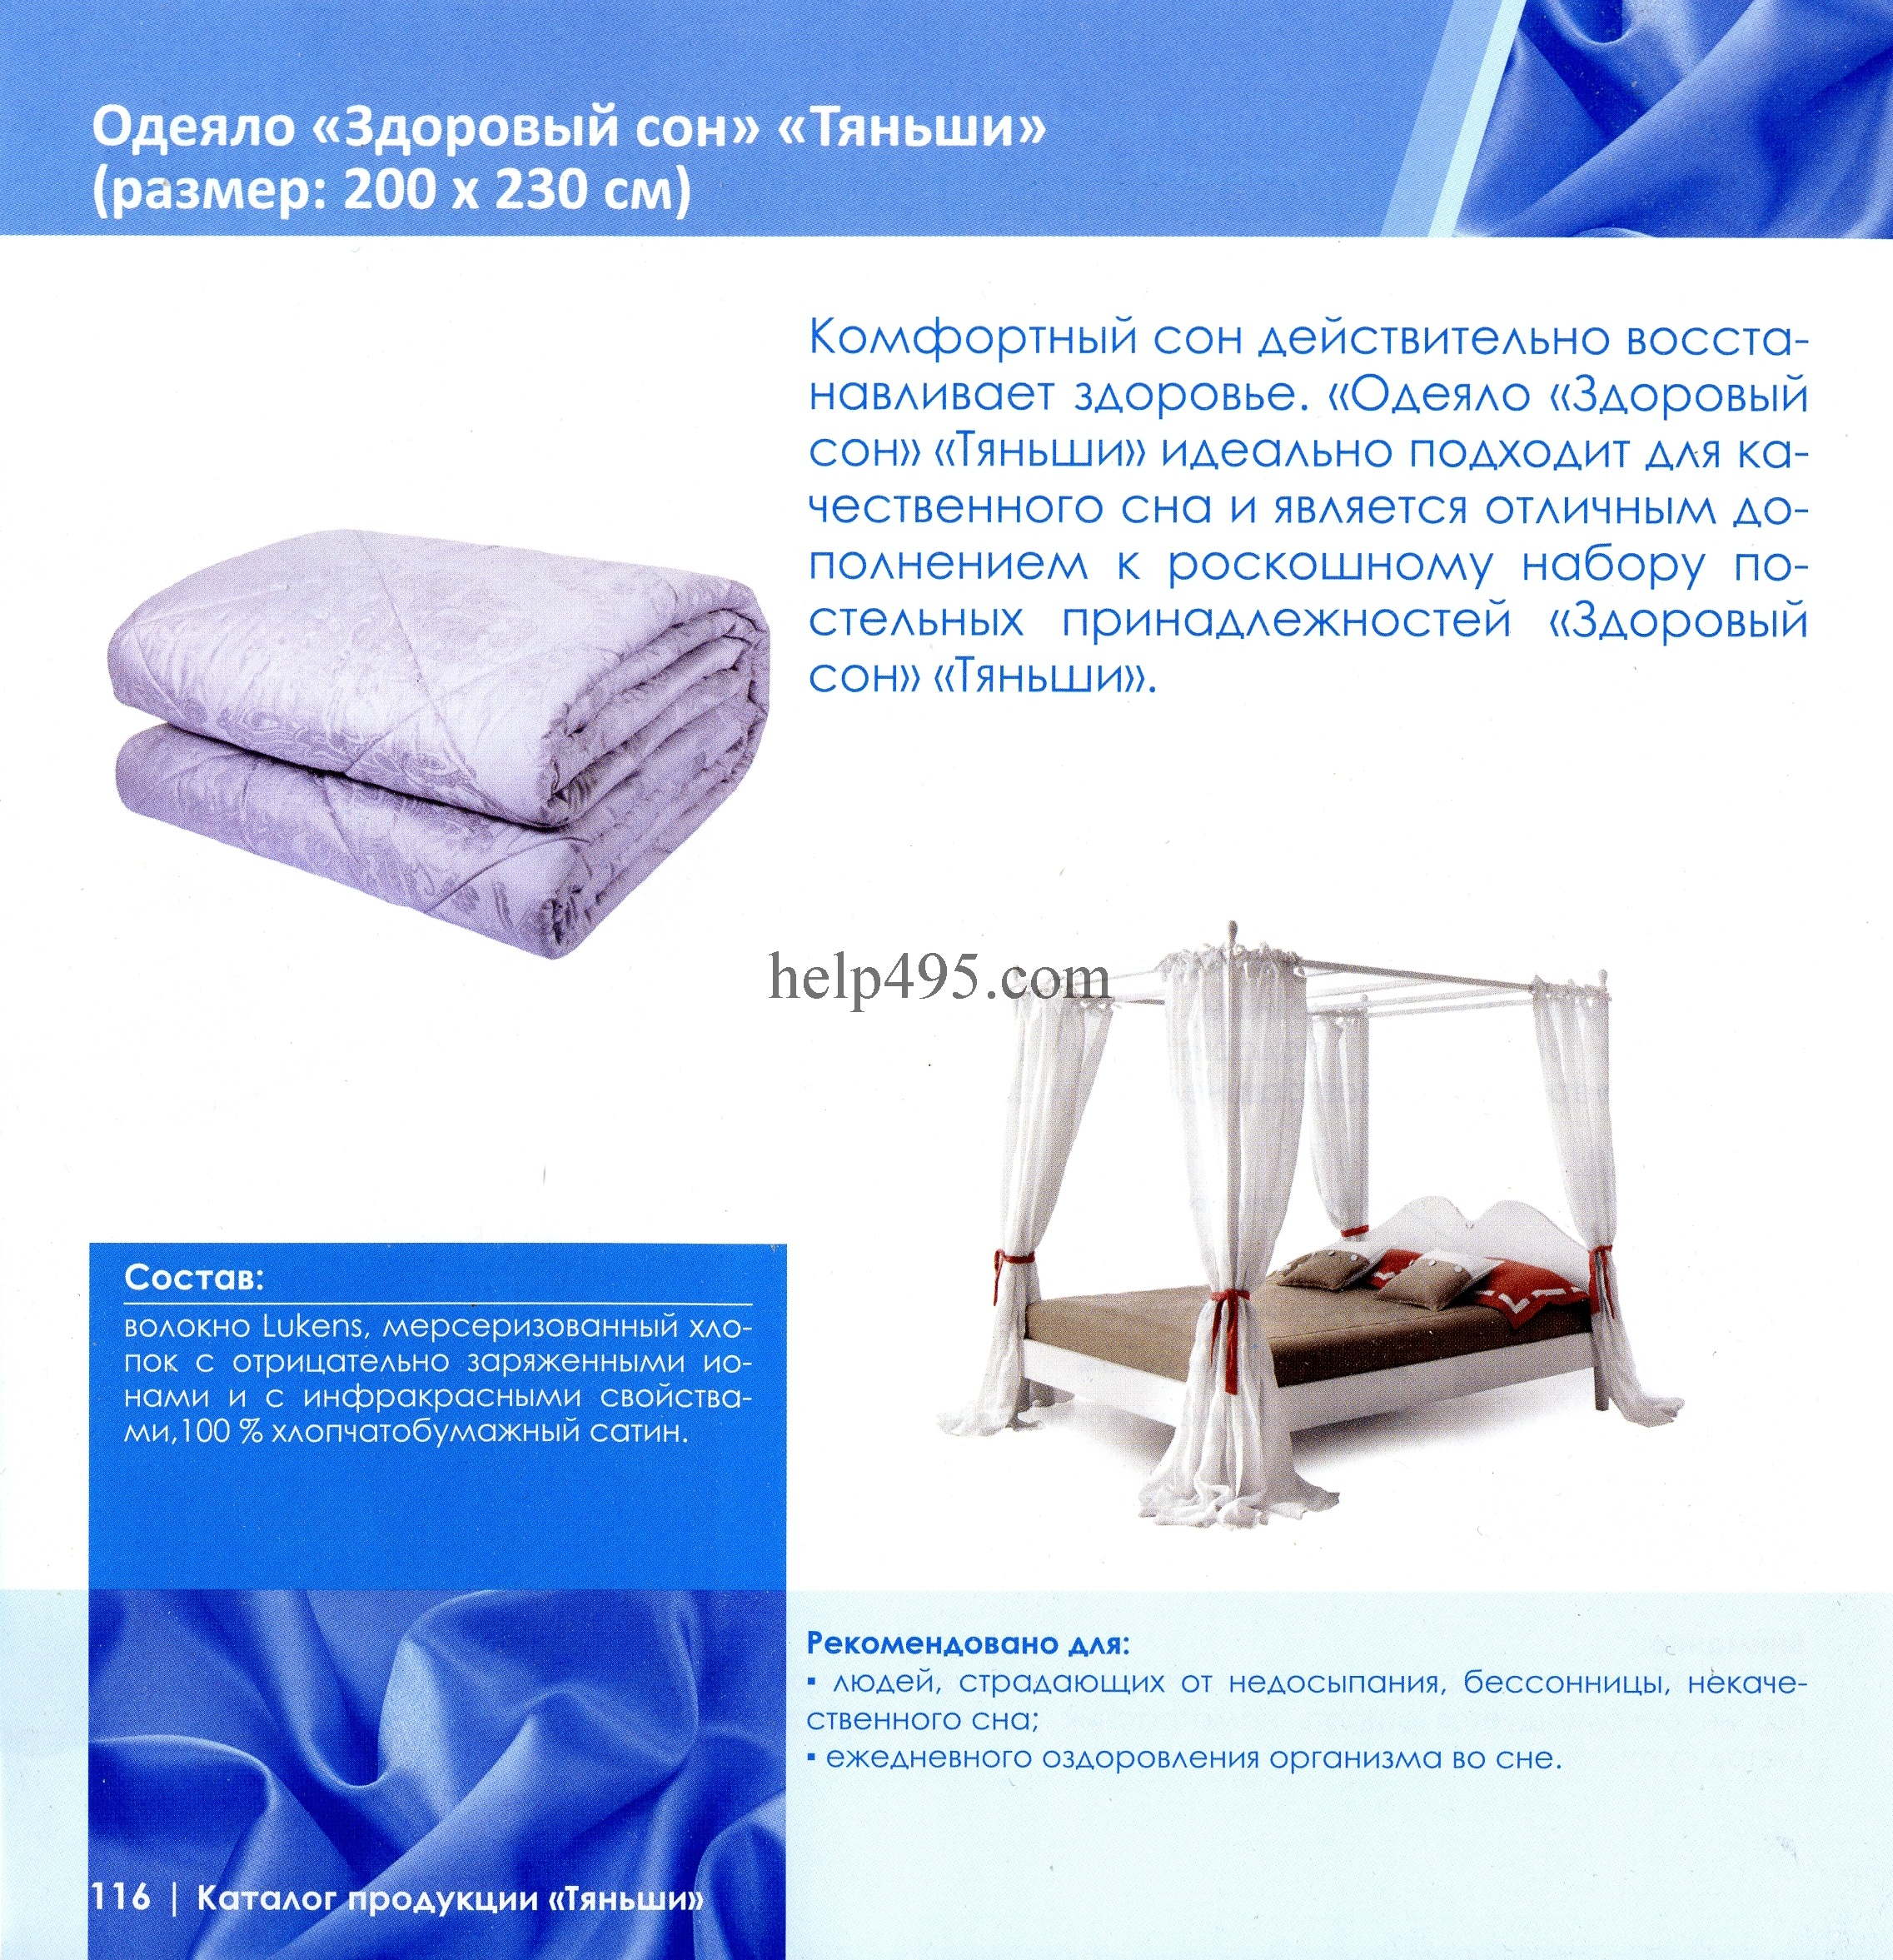 Кому рекомендовано Одеяло Здоровый сон Тяньши?